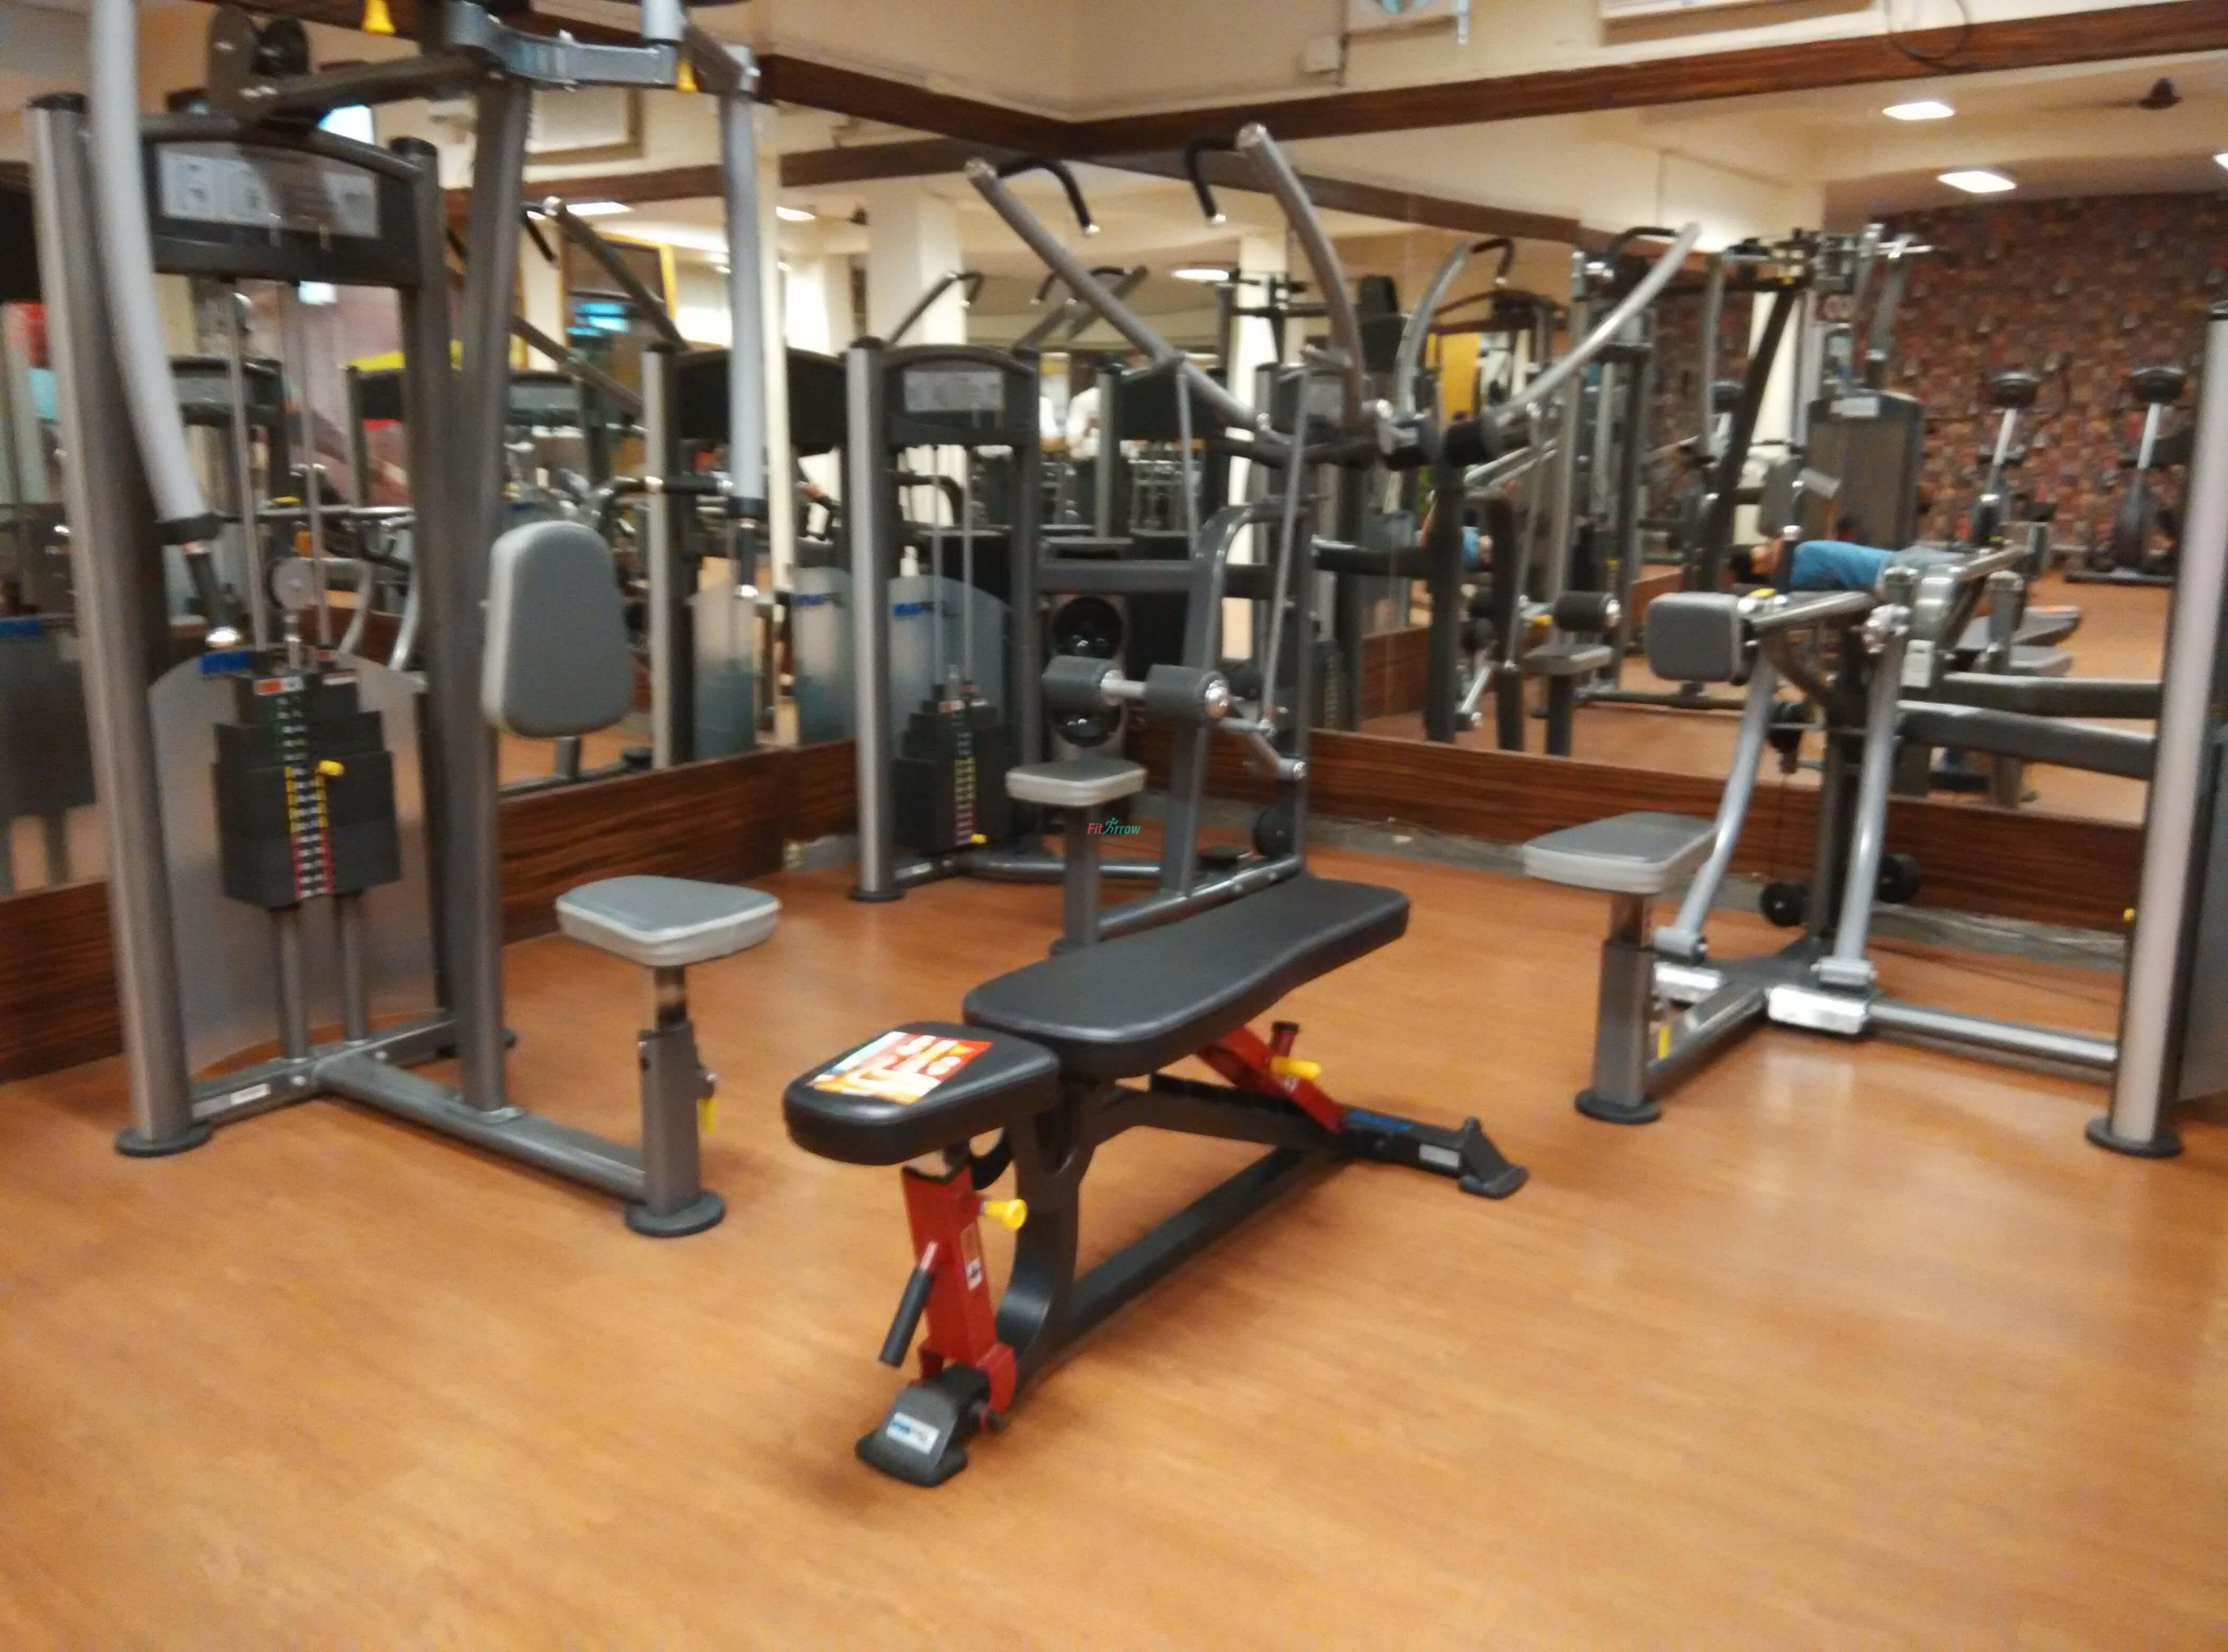 Bodyline gym hyderabad reviews